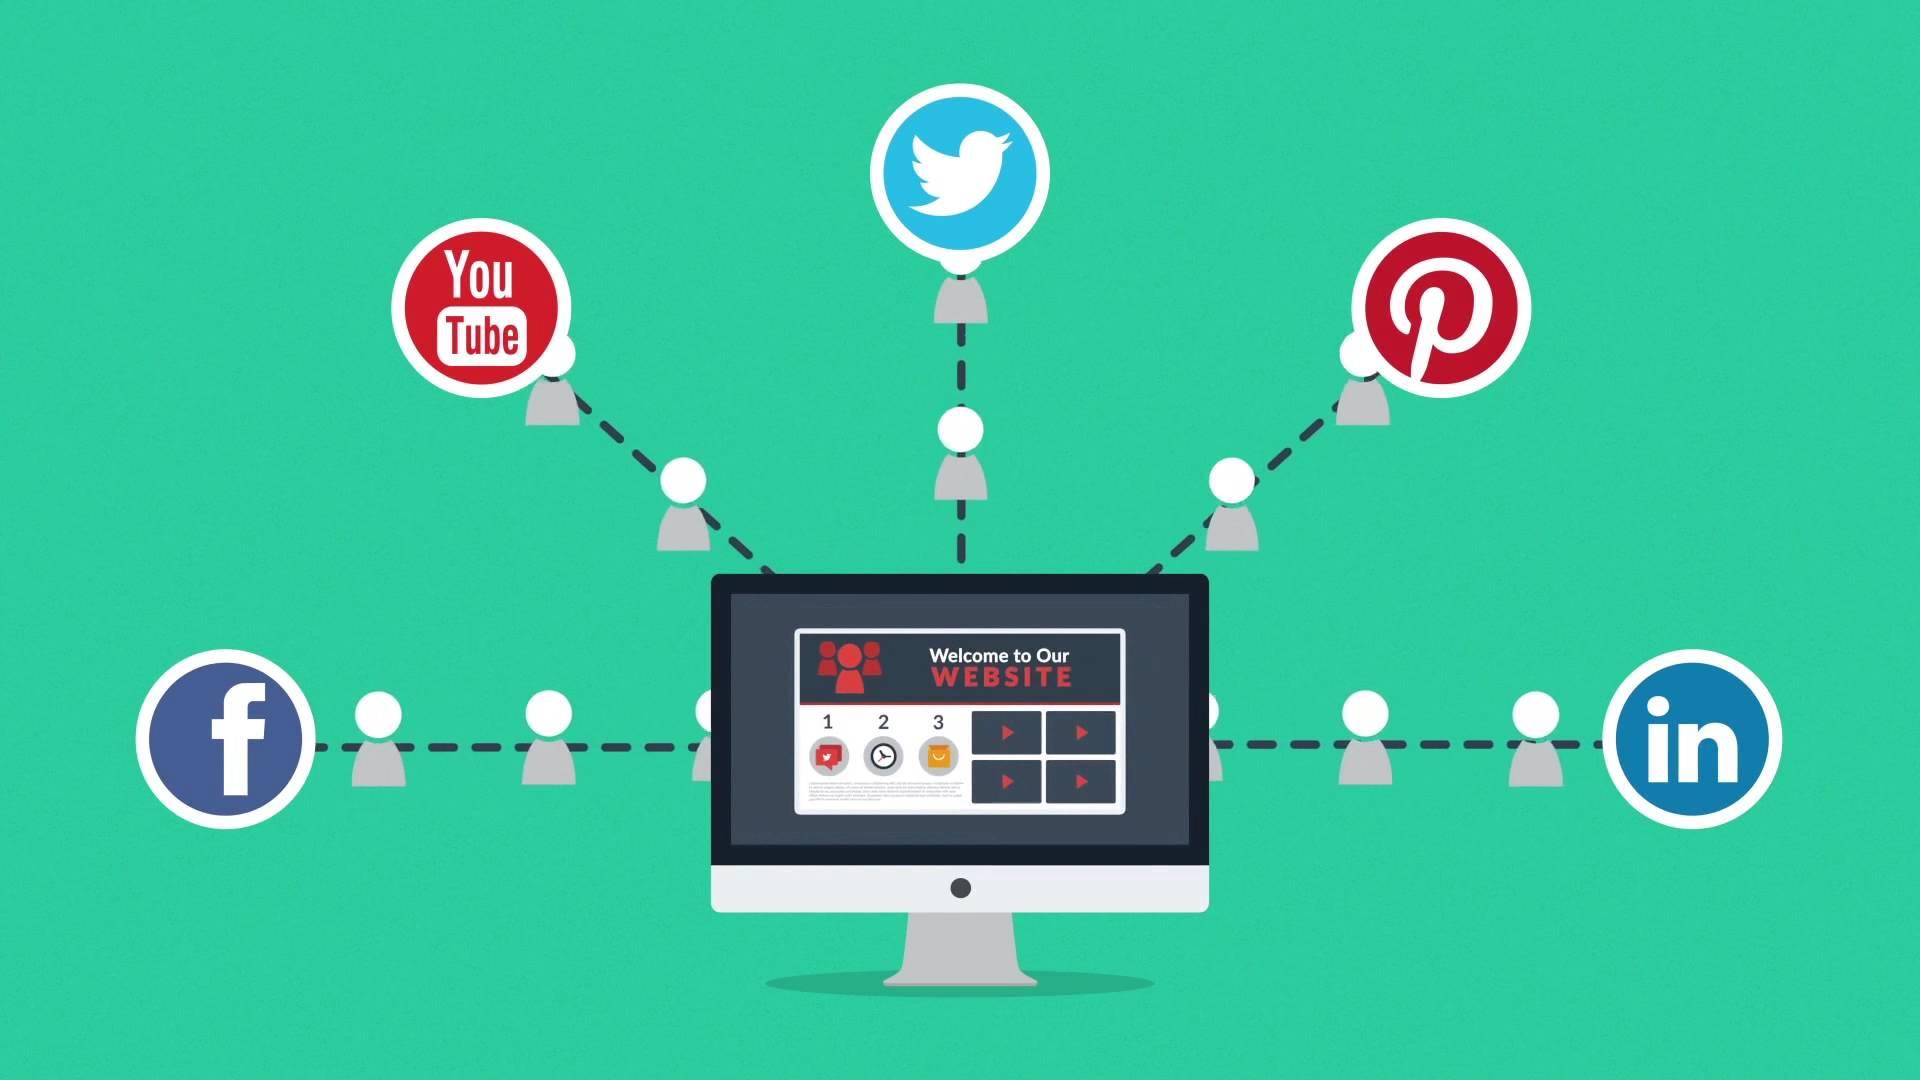 Belang website Online Branders